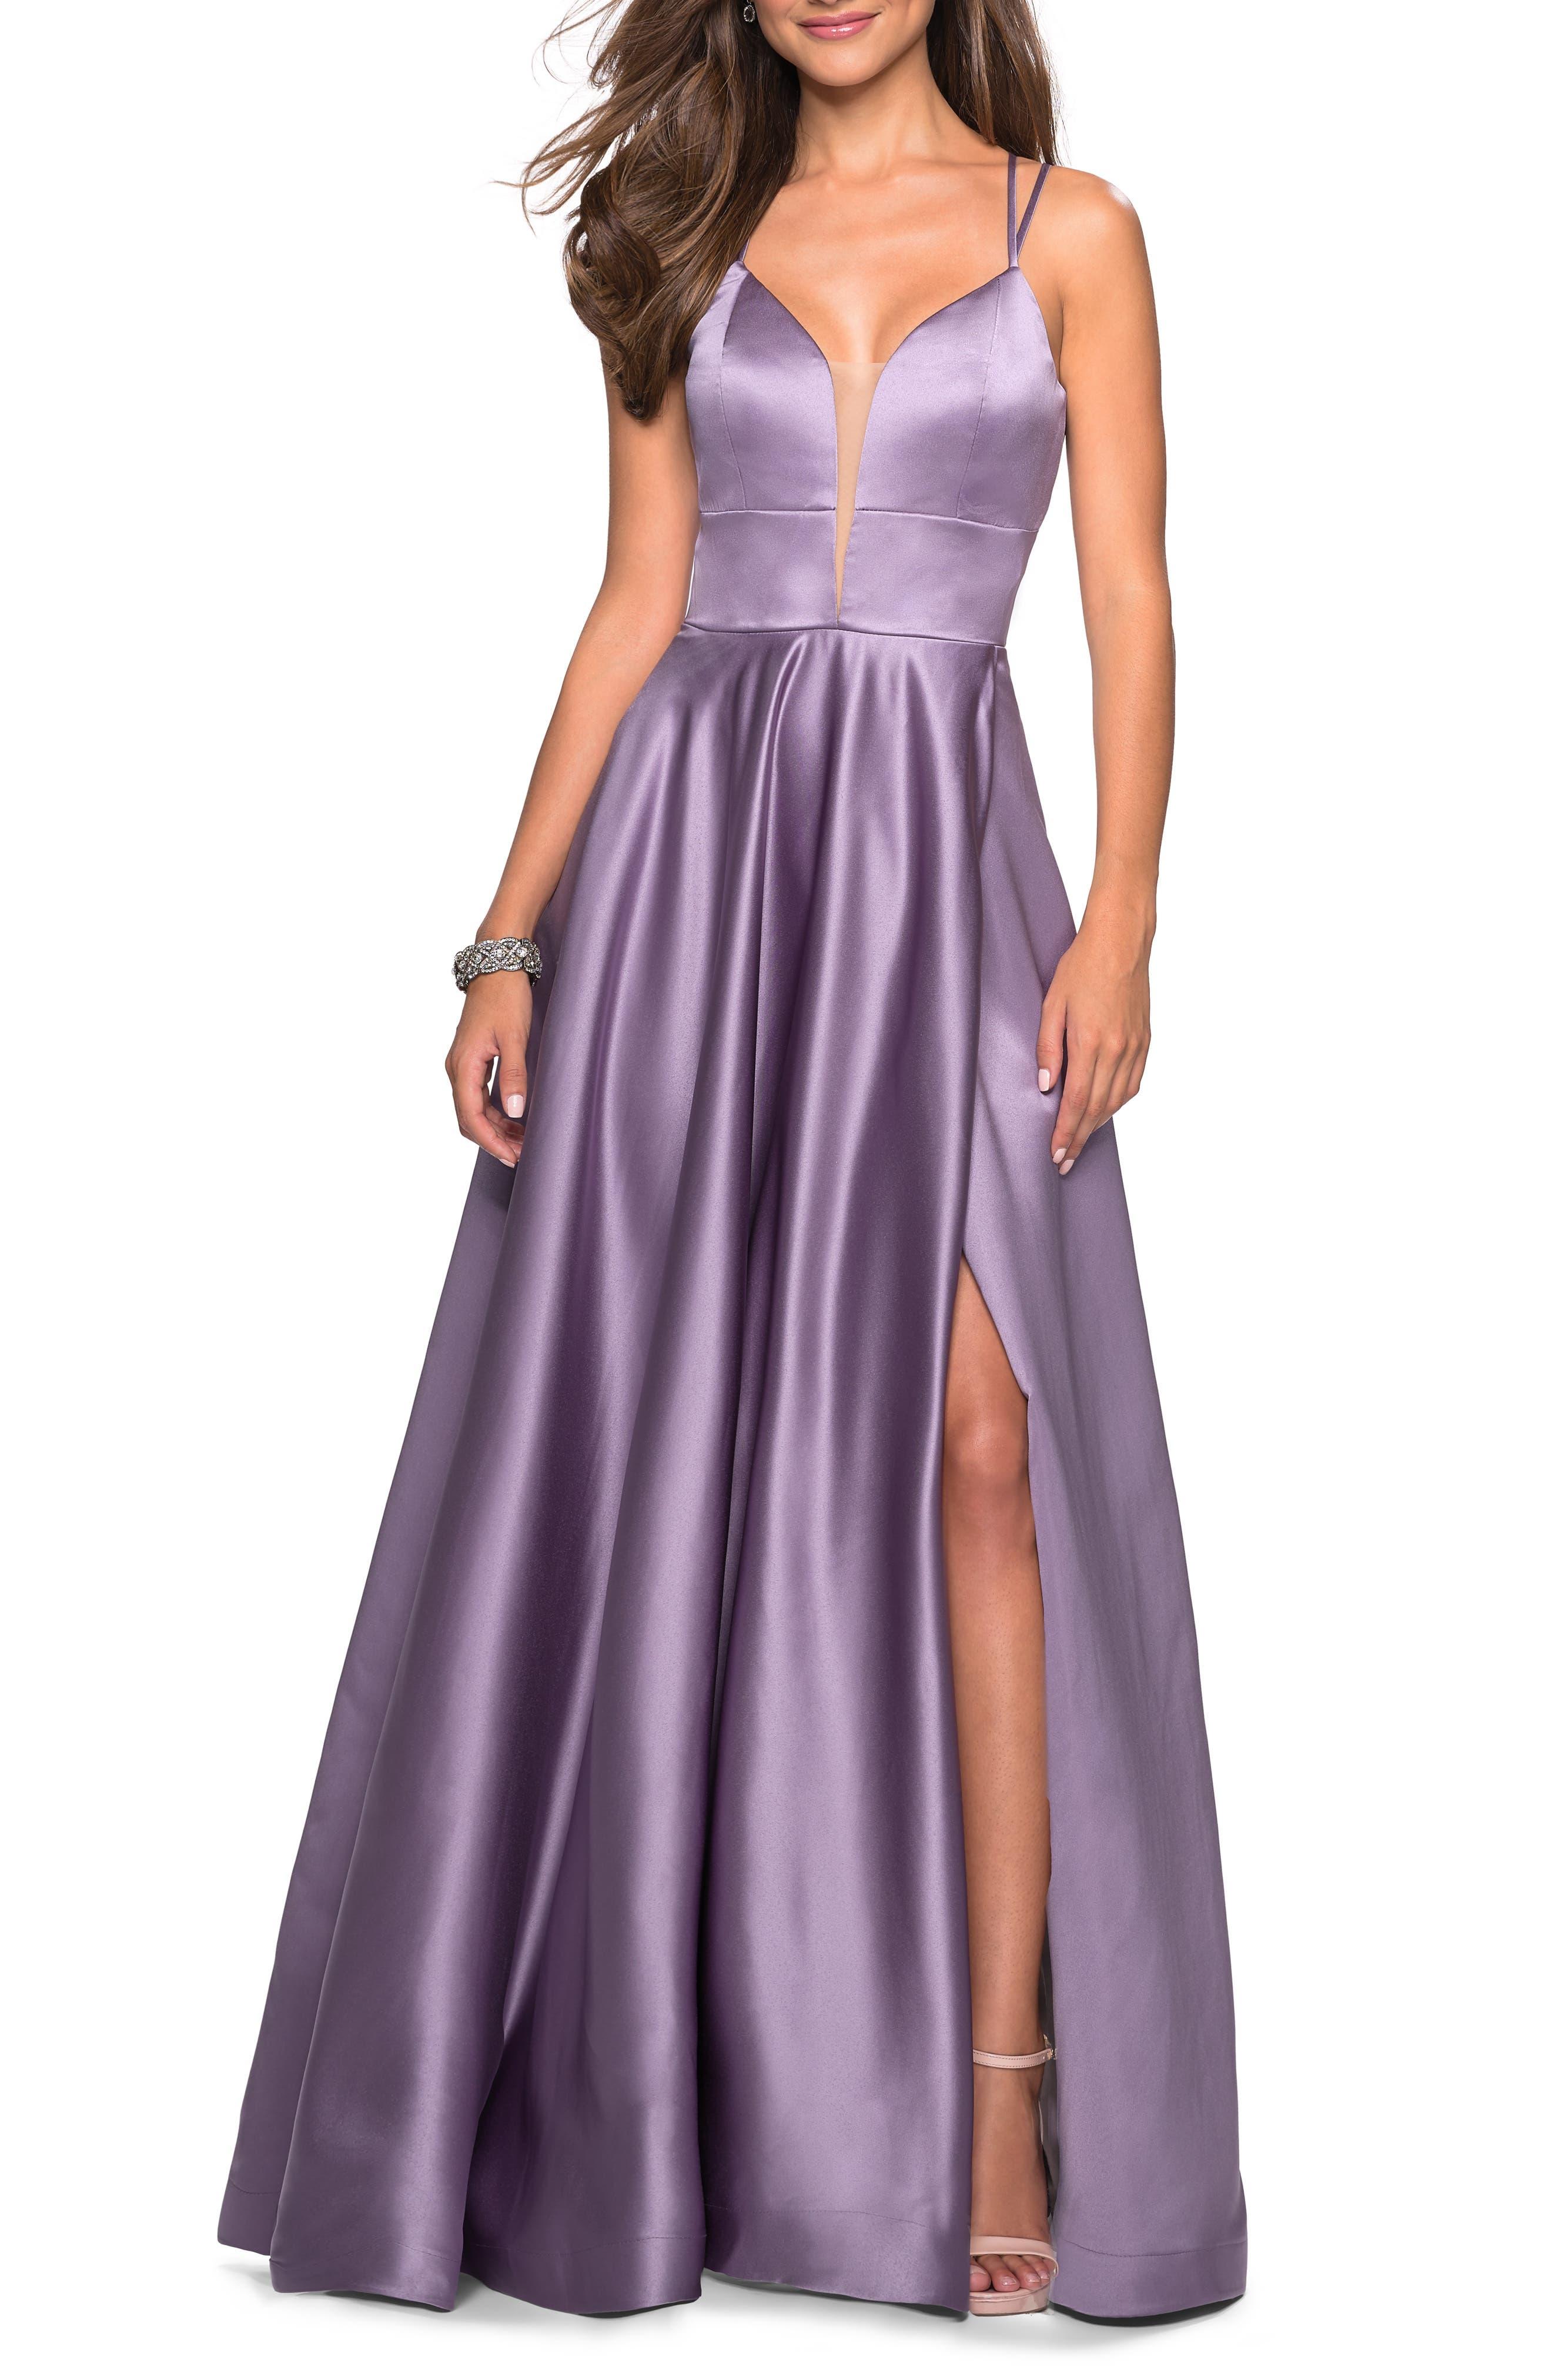 La Femme Strappy Back Satin Evening Dress, Purple